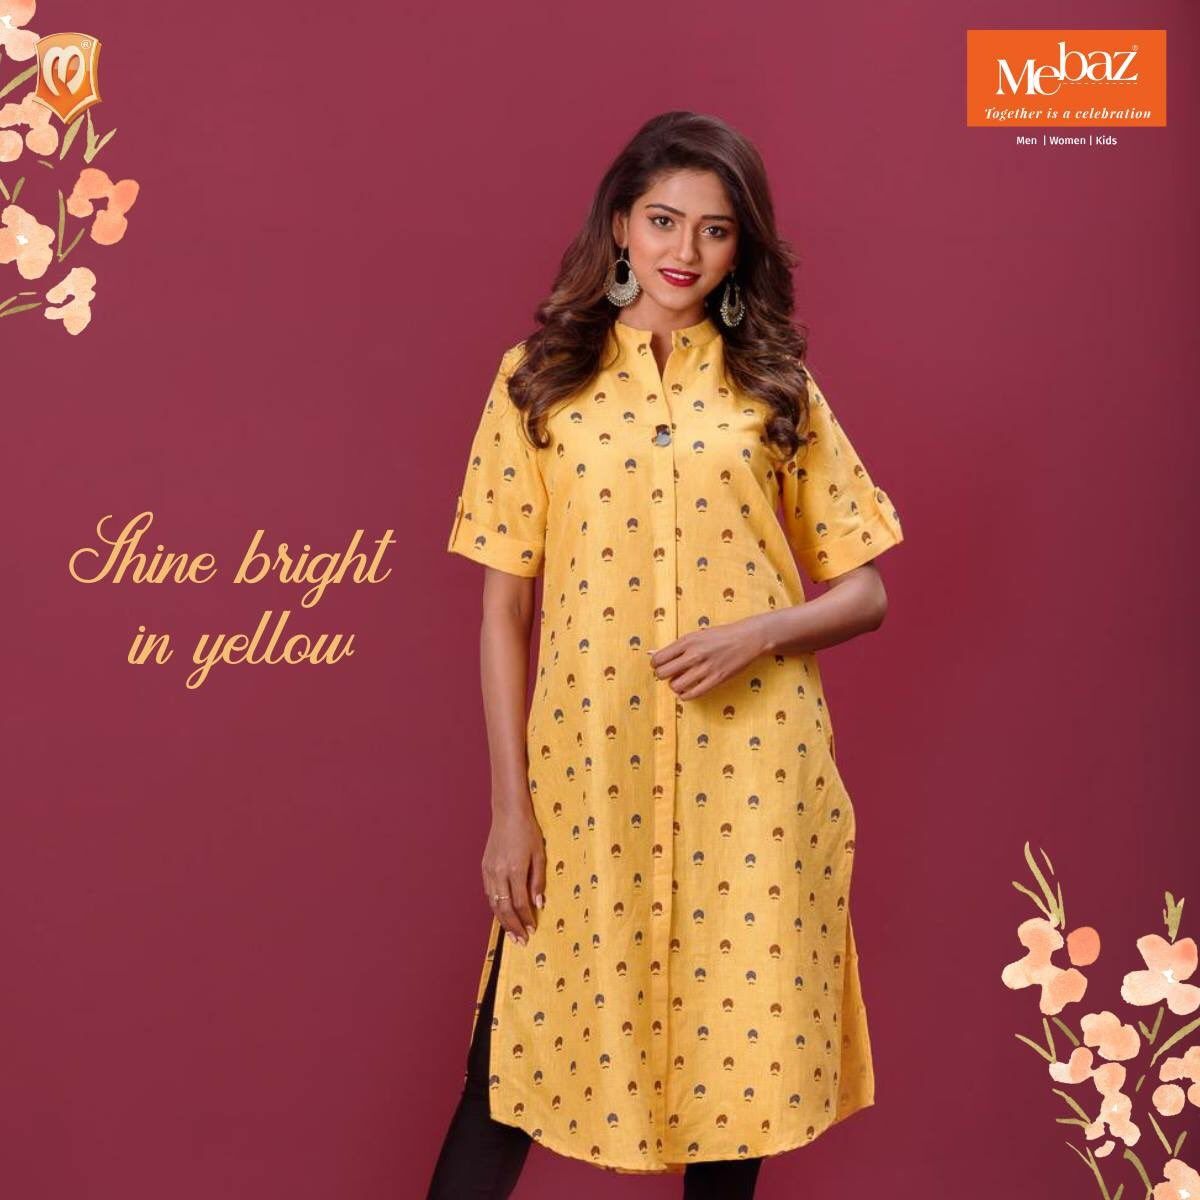 0c0bc240ba Shop online at http://www.mebaz.com today! #Mebaz #Style #design #fashion  #yellow #kurti #chiquepic.twitter.com/35jrtIRzcd